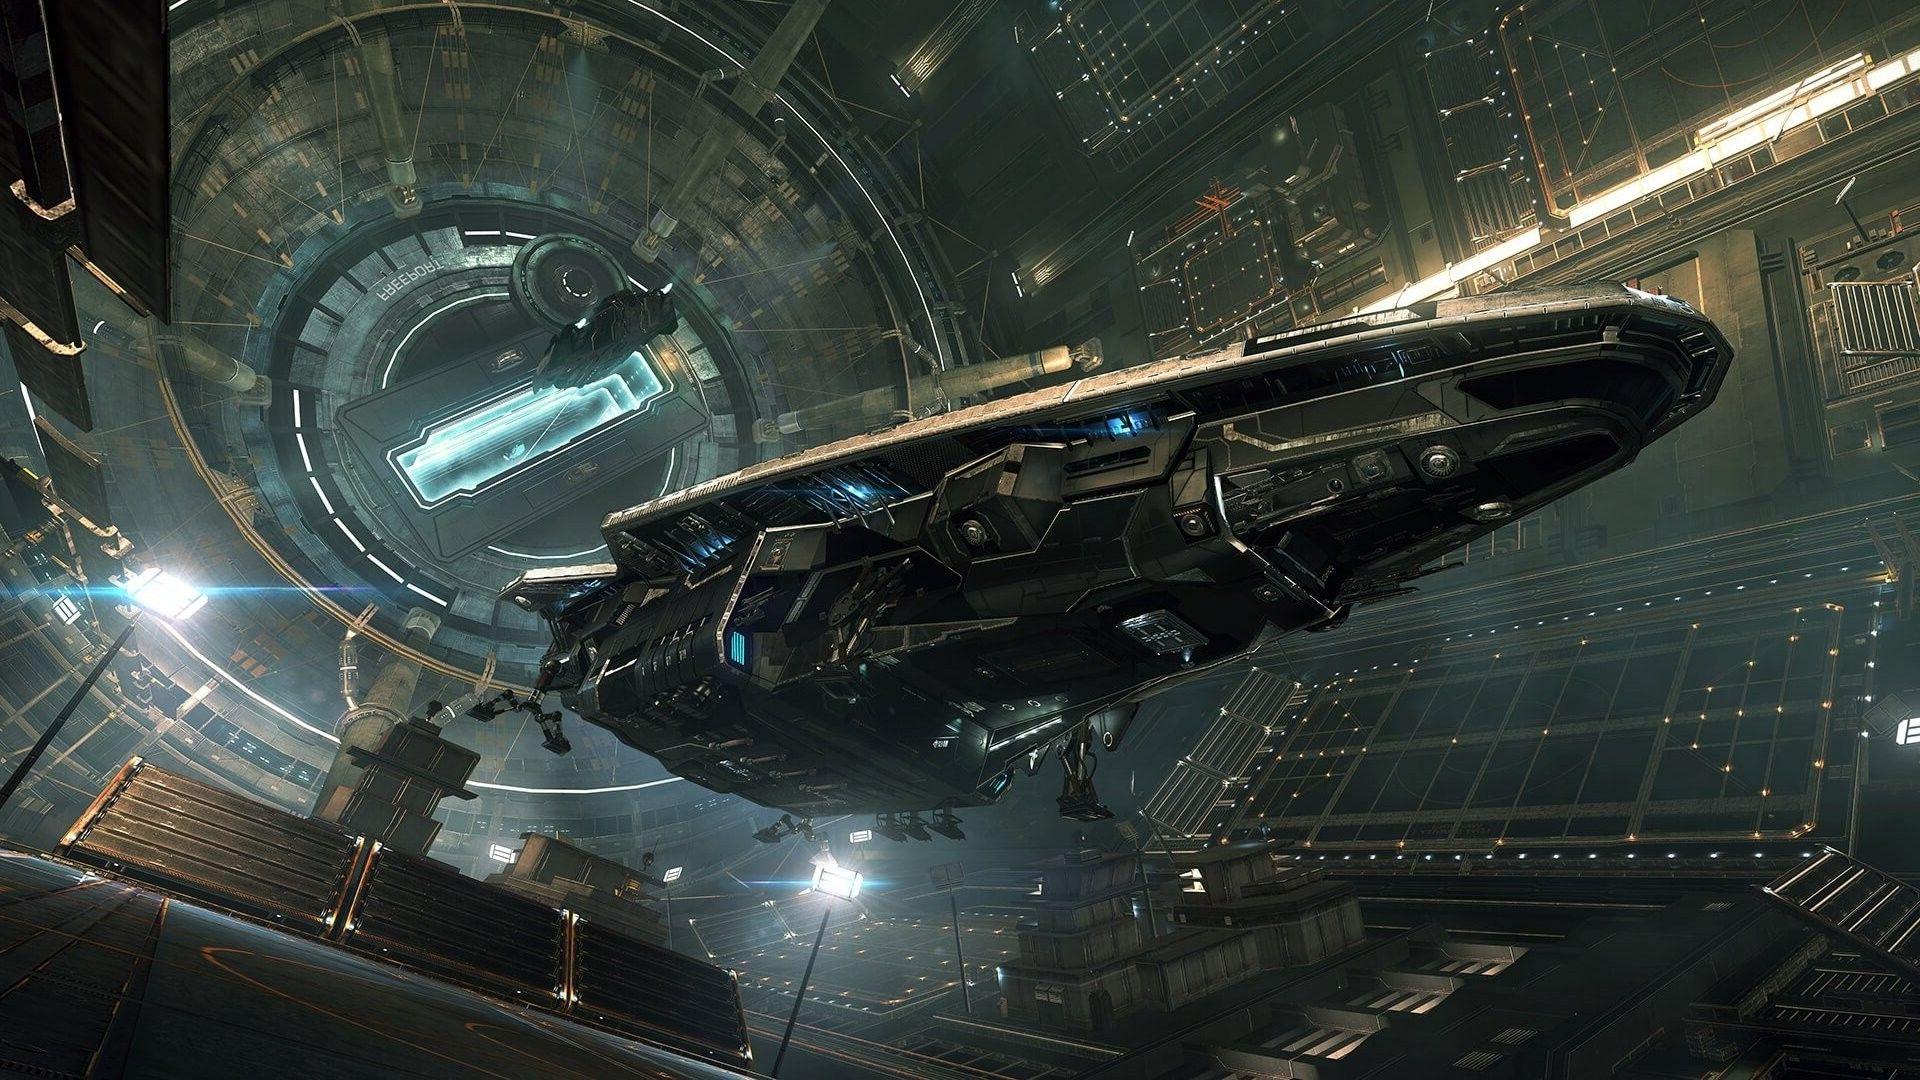 Elite Dangerous Video Games Science Fiction Spaceship Anaconda Spaceship Wallpaper Elite Dangerous Ships Star Citizen Sci Fi Ships